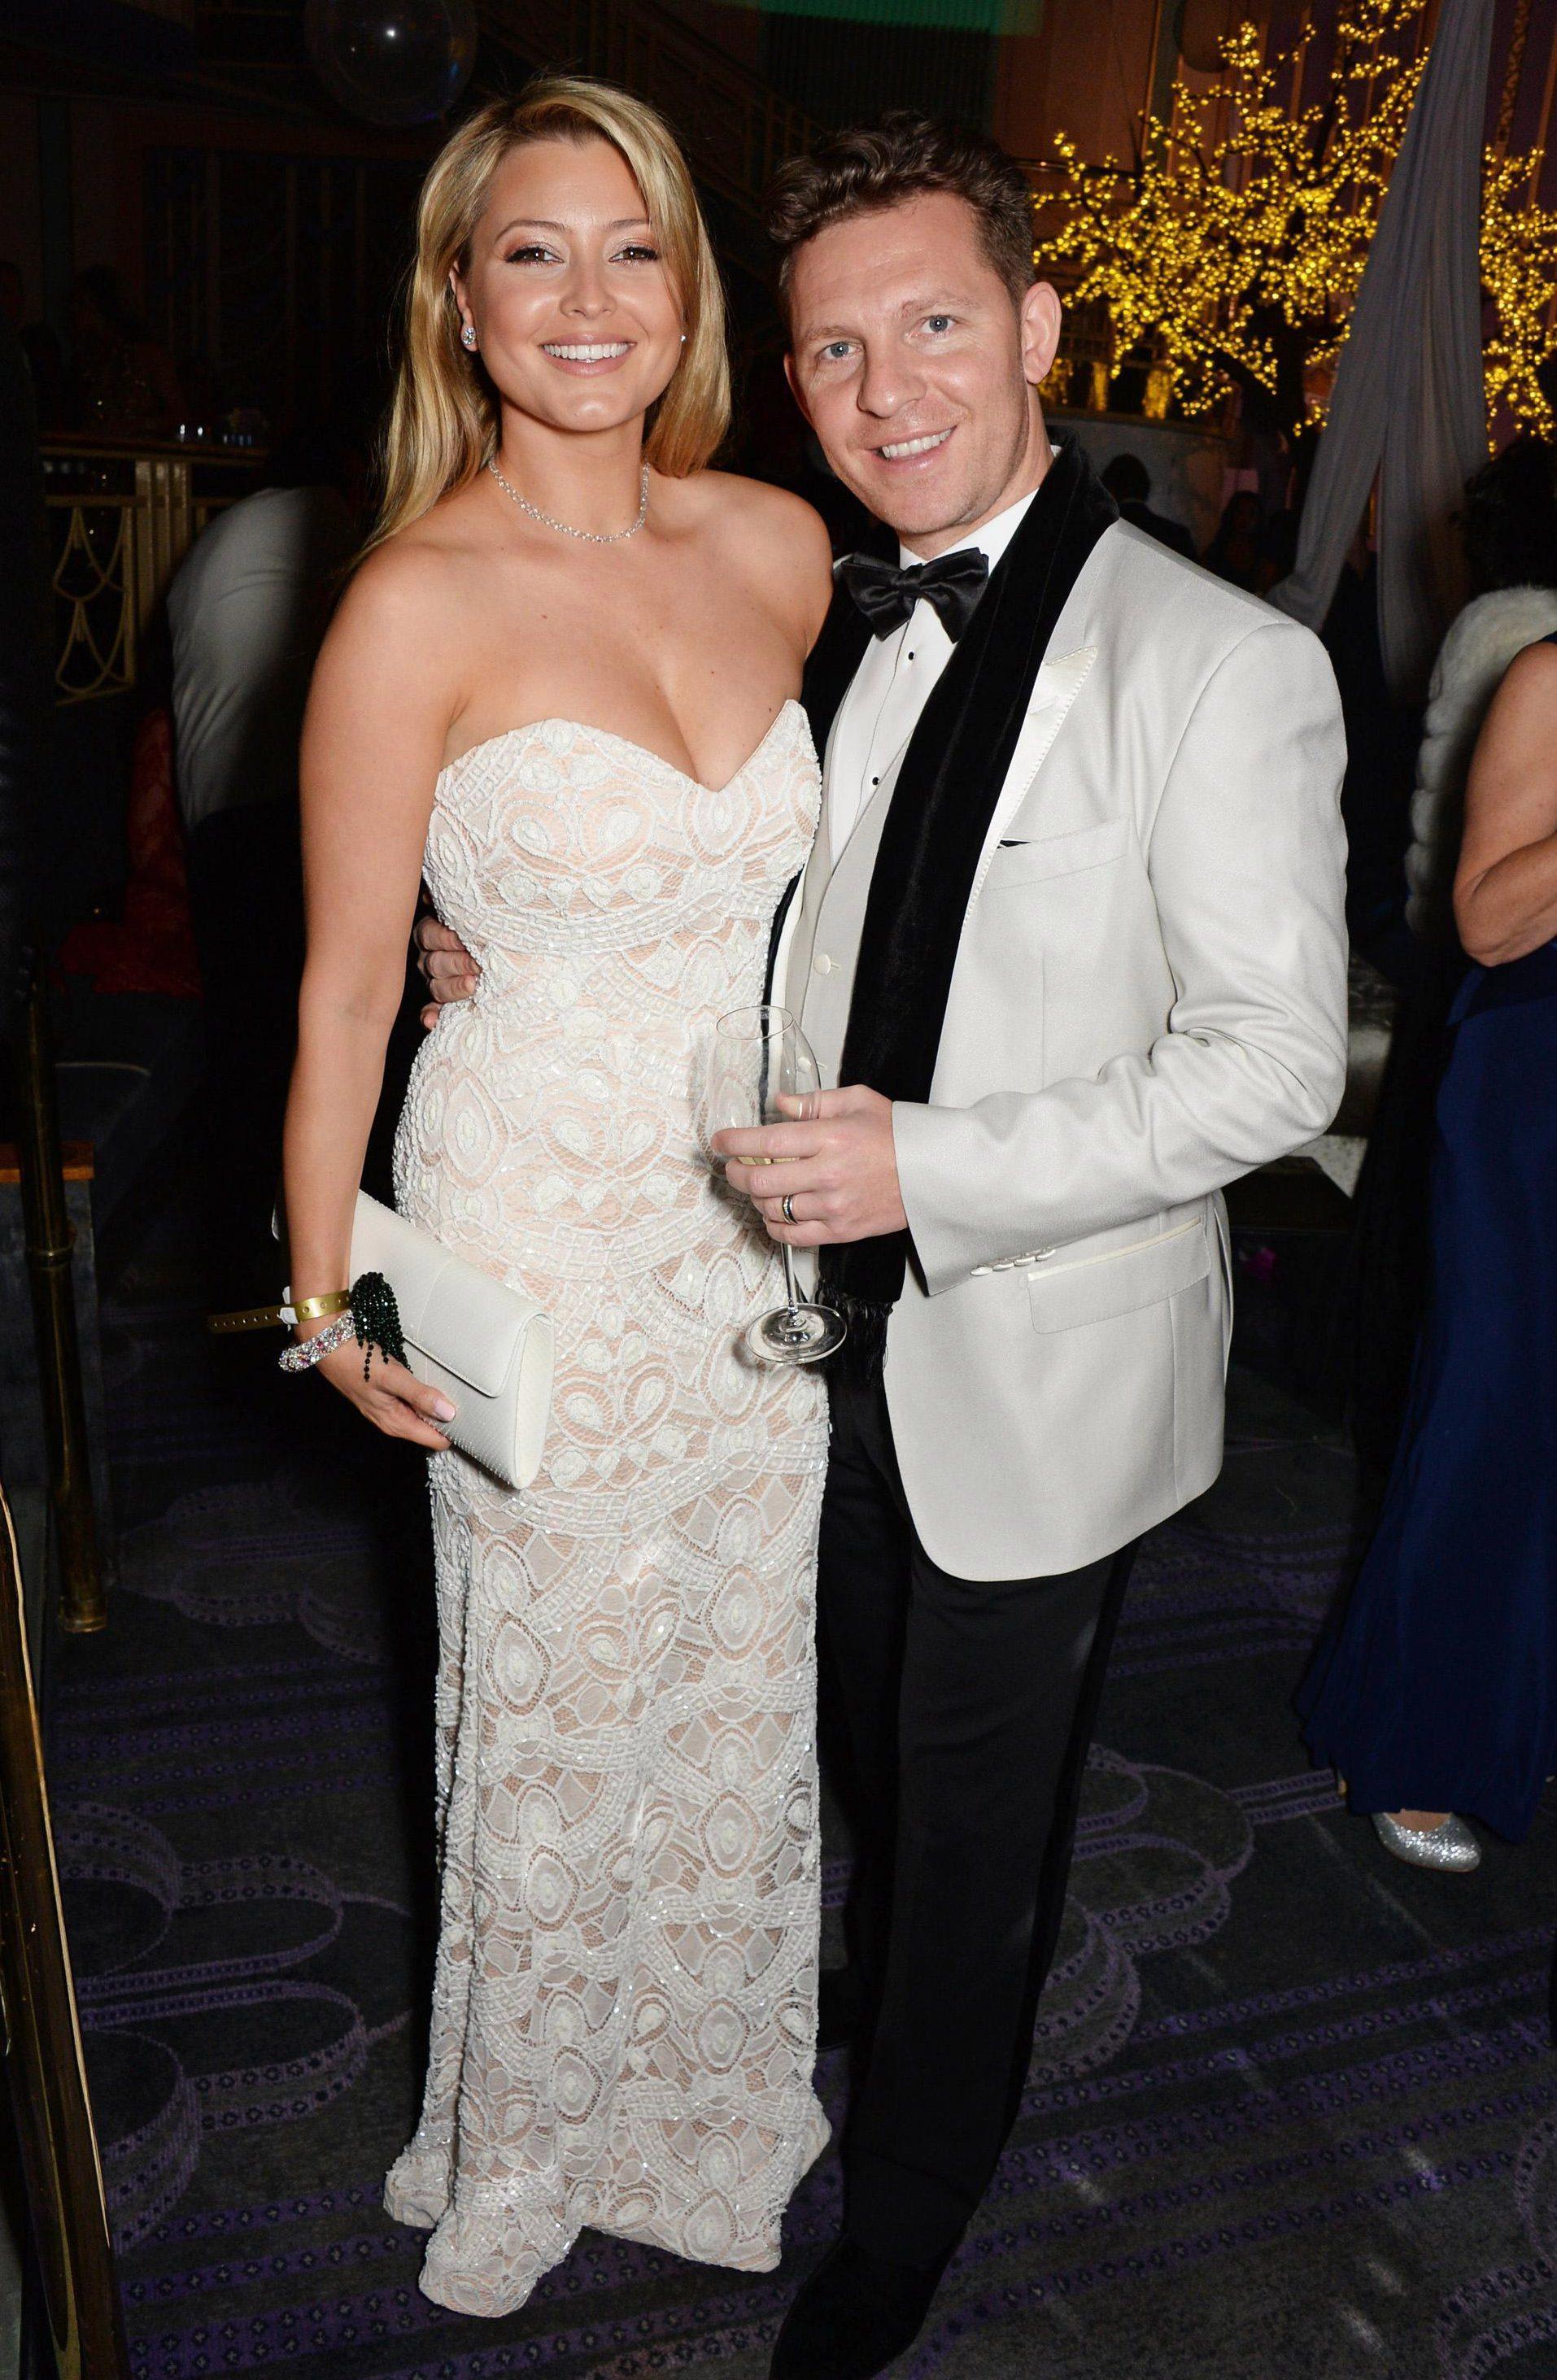 Holly Valance S Property Tycoon Husband Nick Candy Wins 1